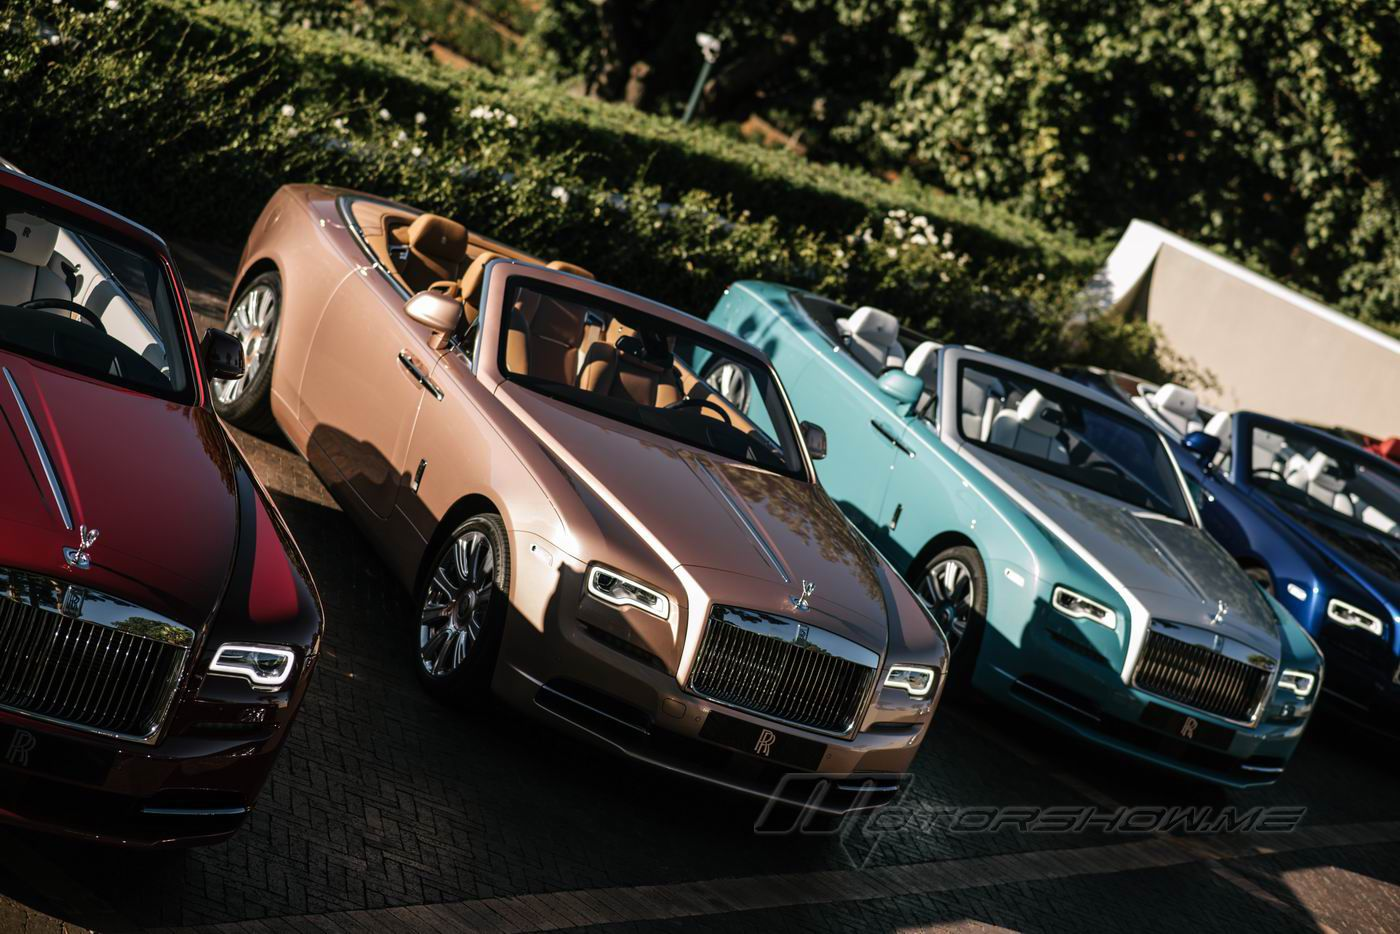 2016 Dawn The Sexiest Rolls Royce Ever Built